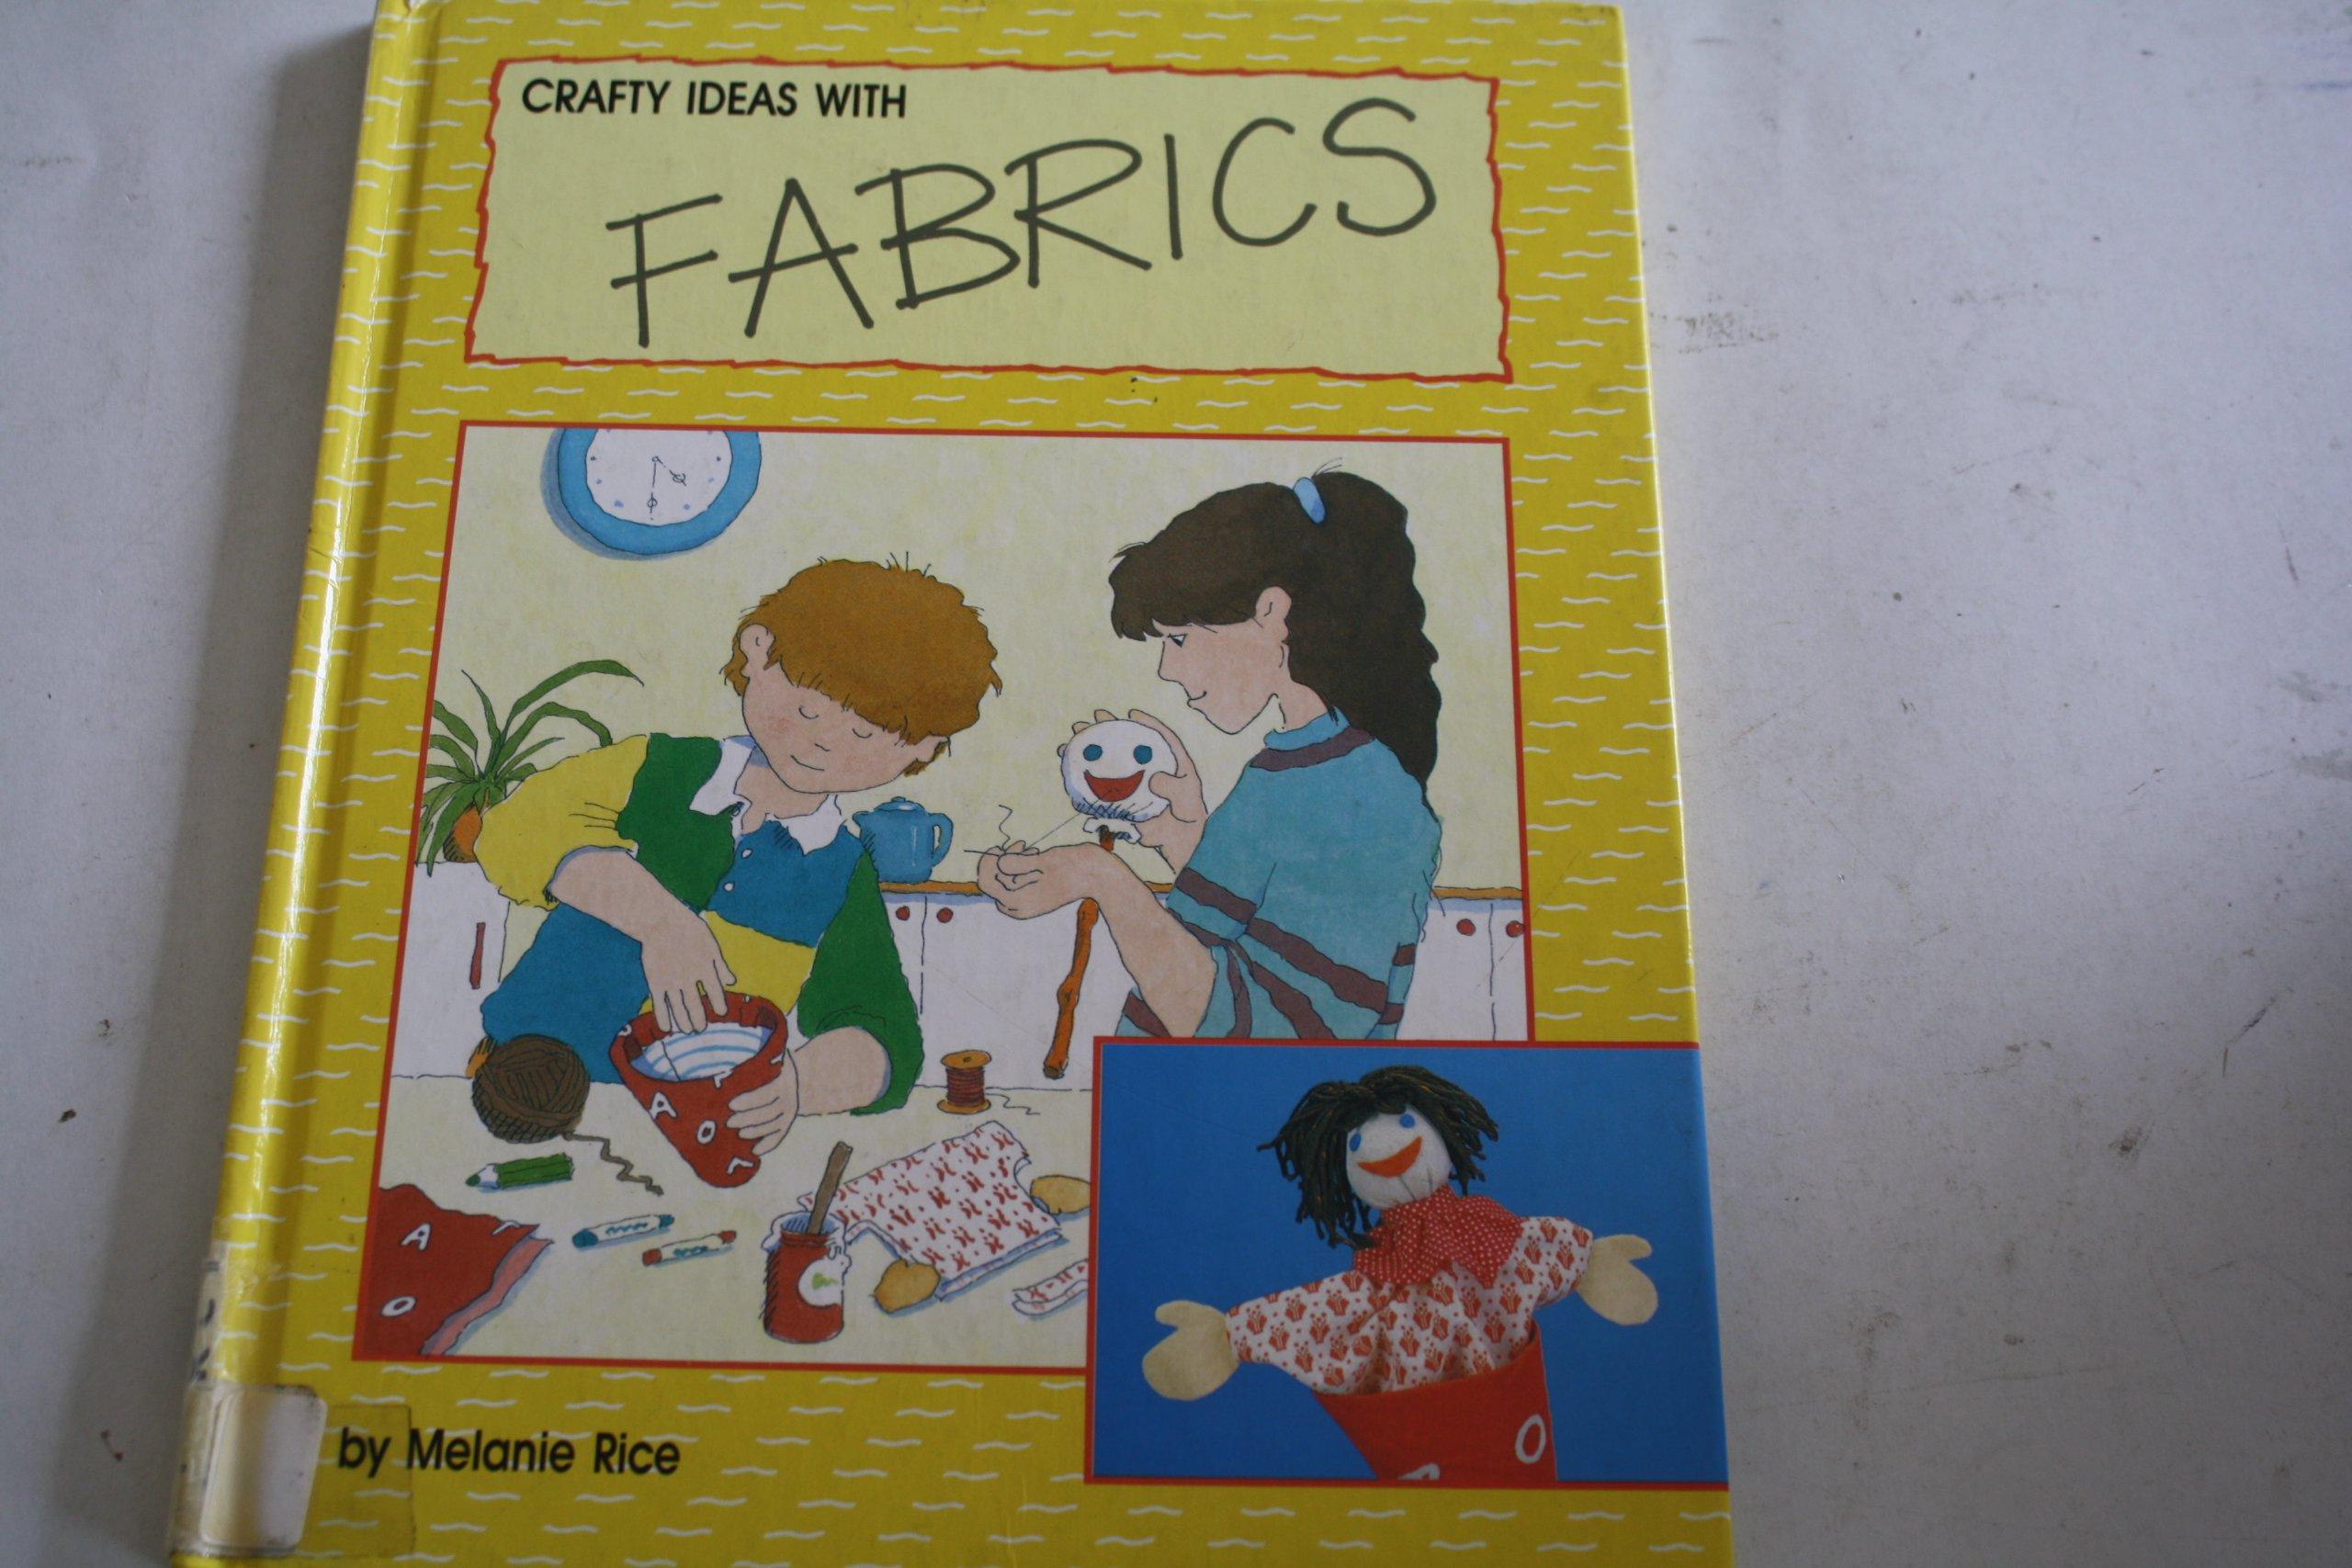 Crafty Ideas with Fabrics